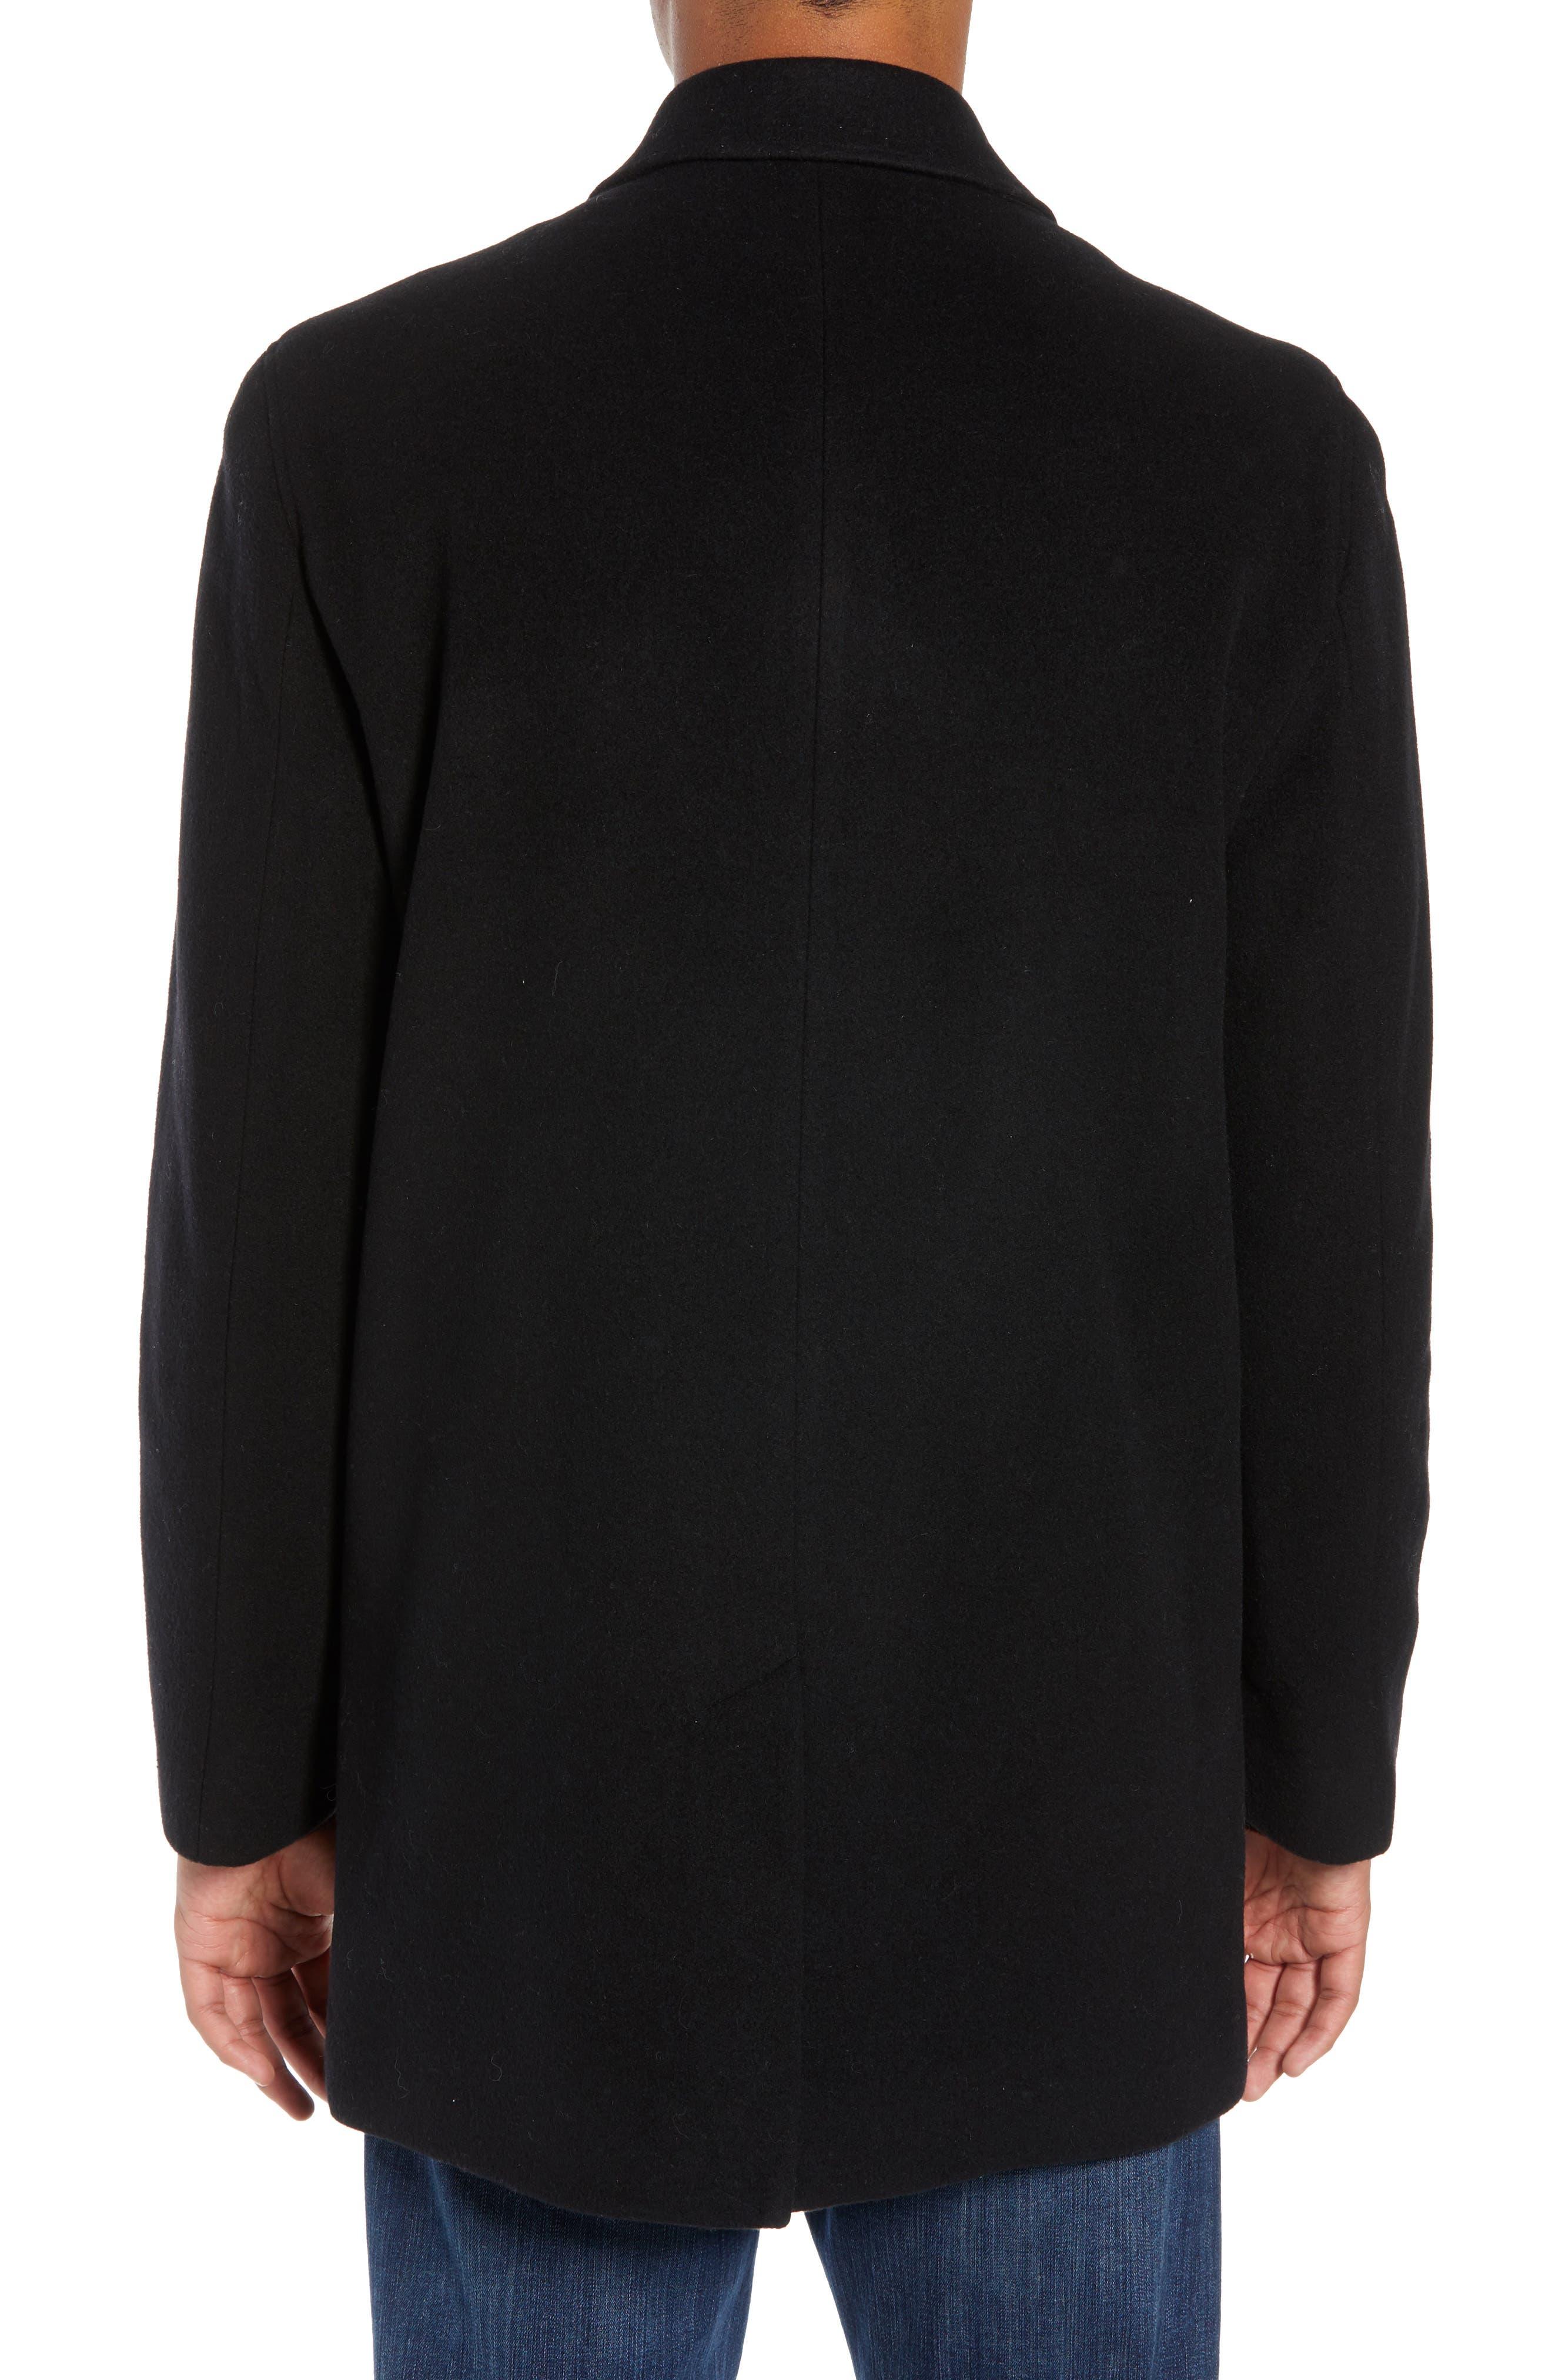 COLE HAAN, Italian Wool Blend Overcoat, Alternate thumbnail 2, color, 001